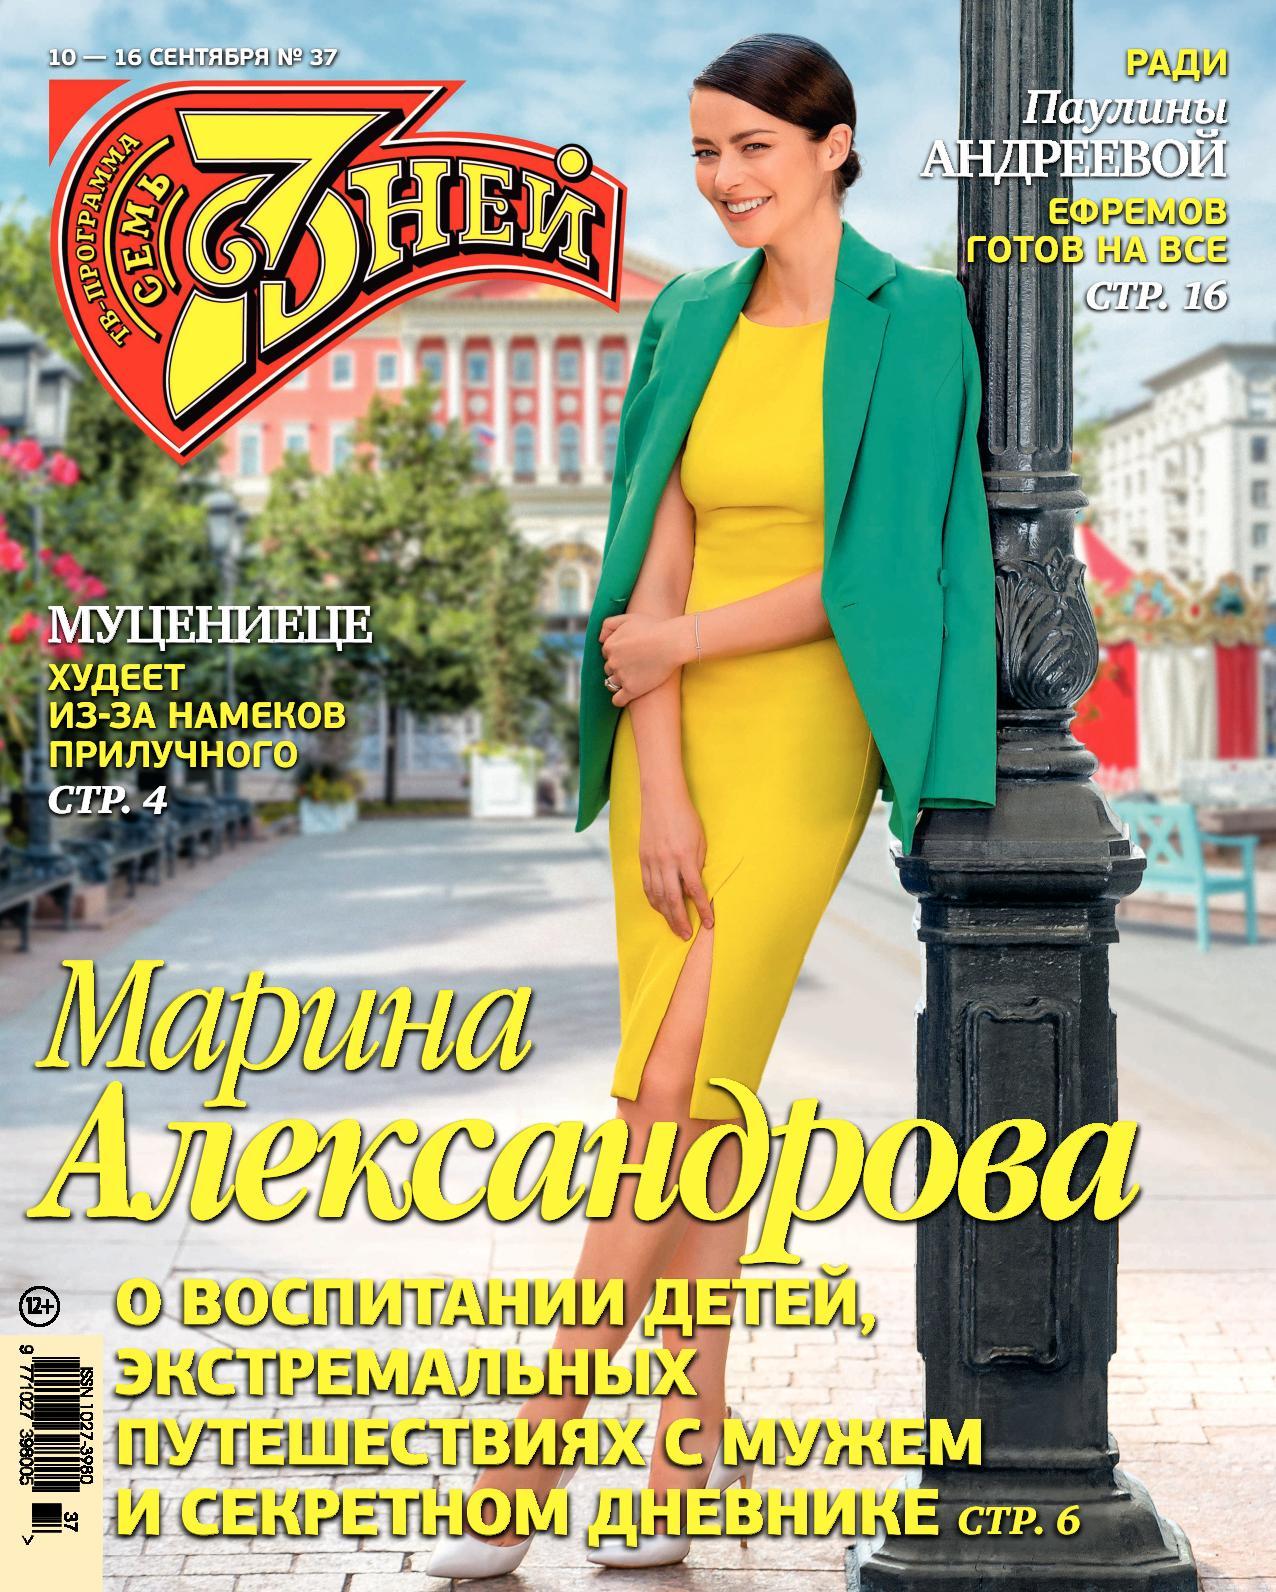 trah-horvatskaya-model-ana-tanich-foto